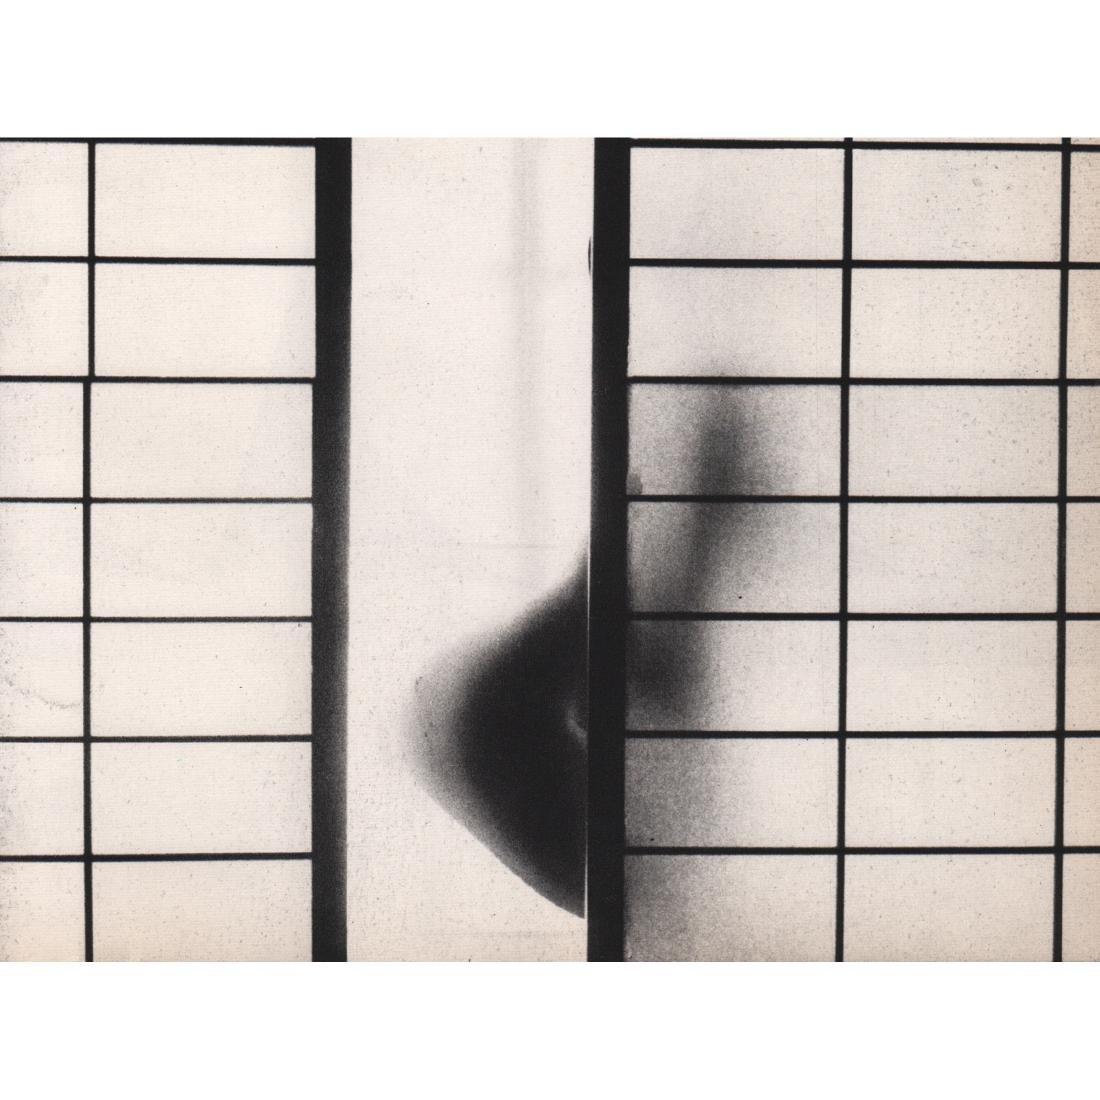 MINORU TANAKA - Lines and Curves